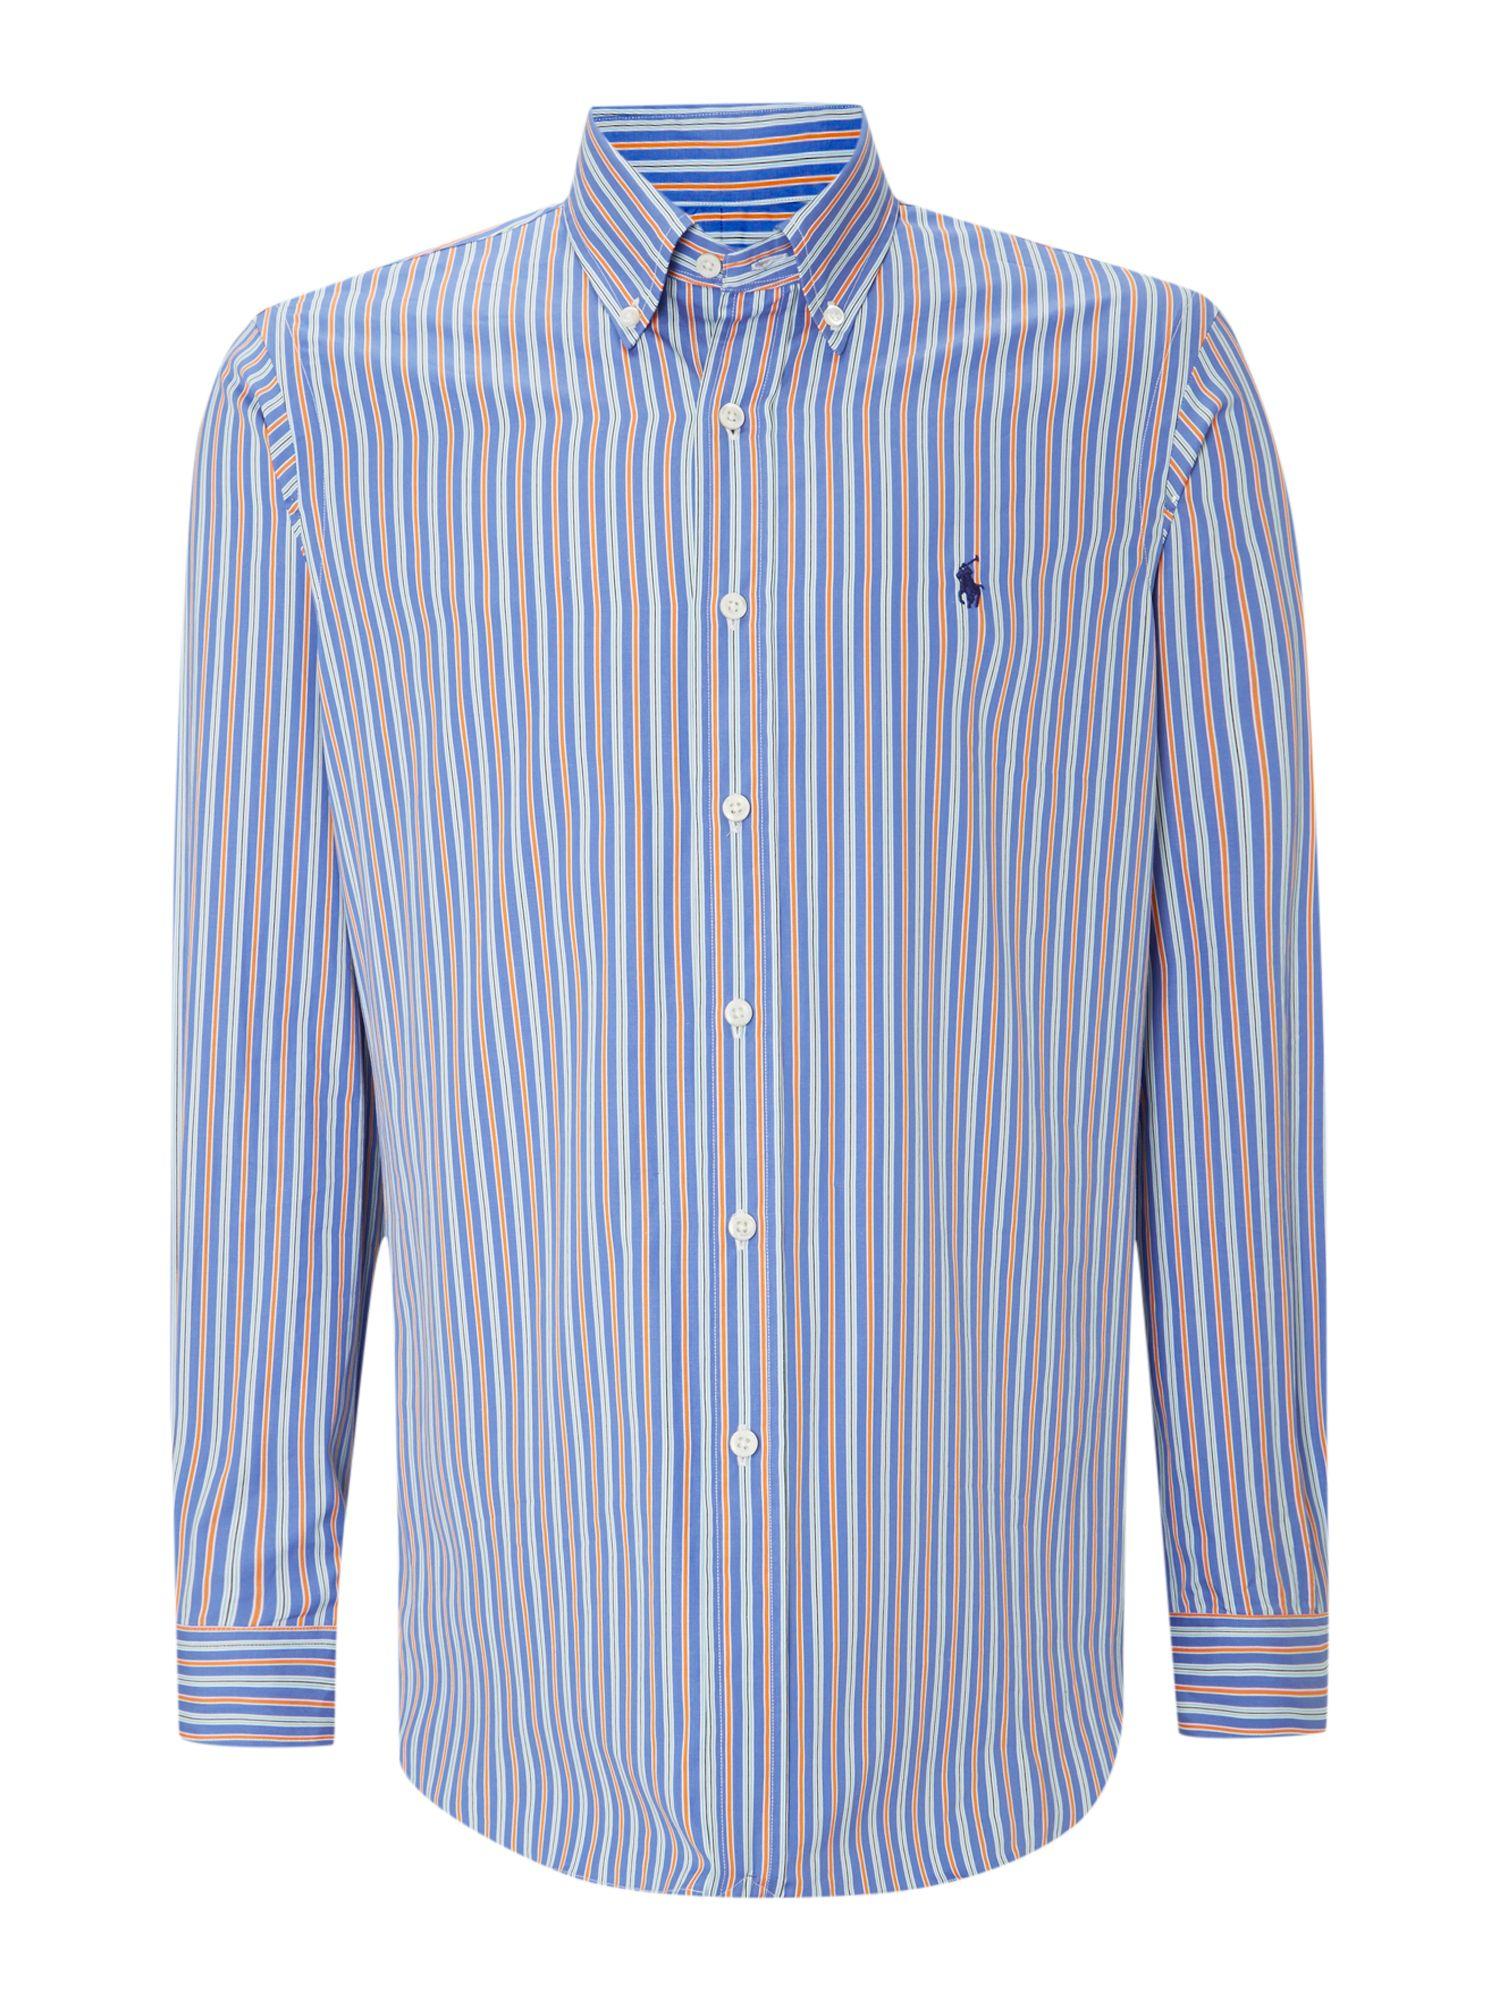 Polo Ralph Lauren Long Sleeve Custom Fit Multi Stripe